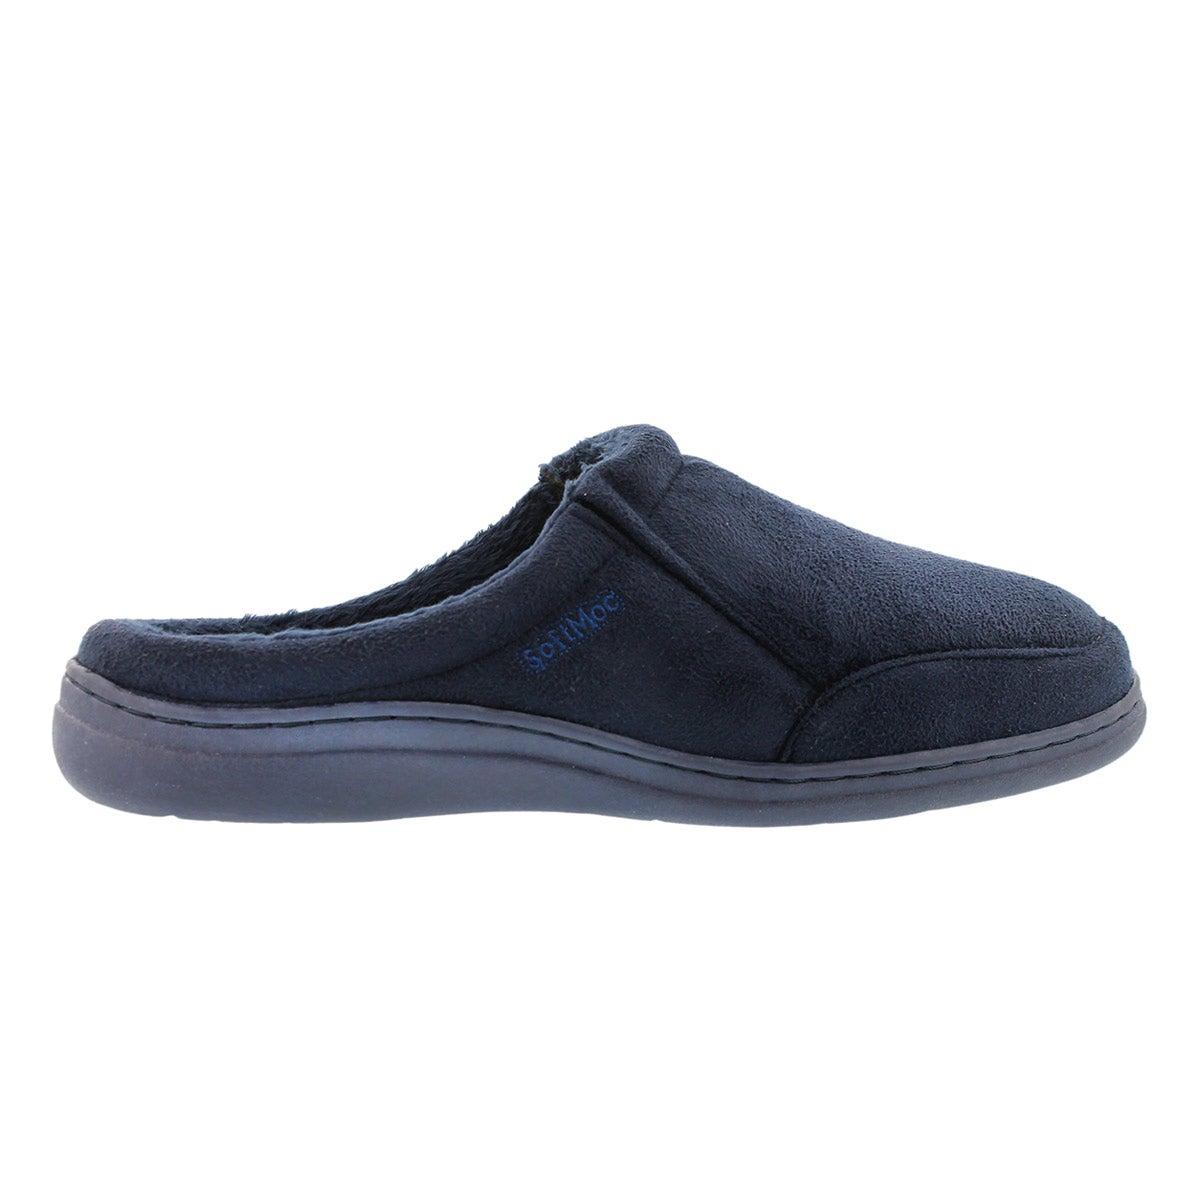 Mns Polar II navy open back slipper